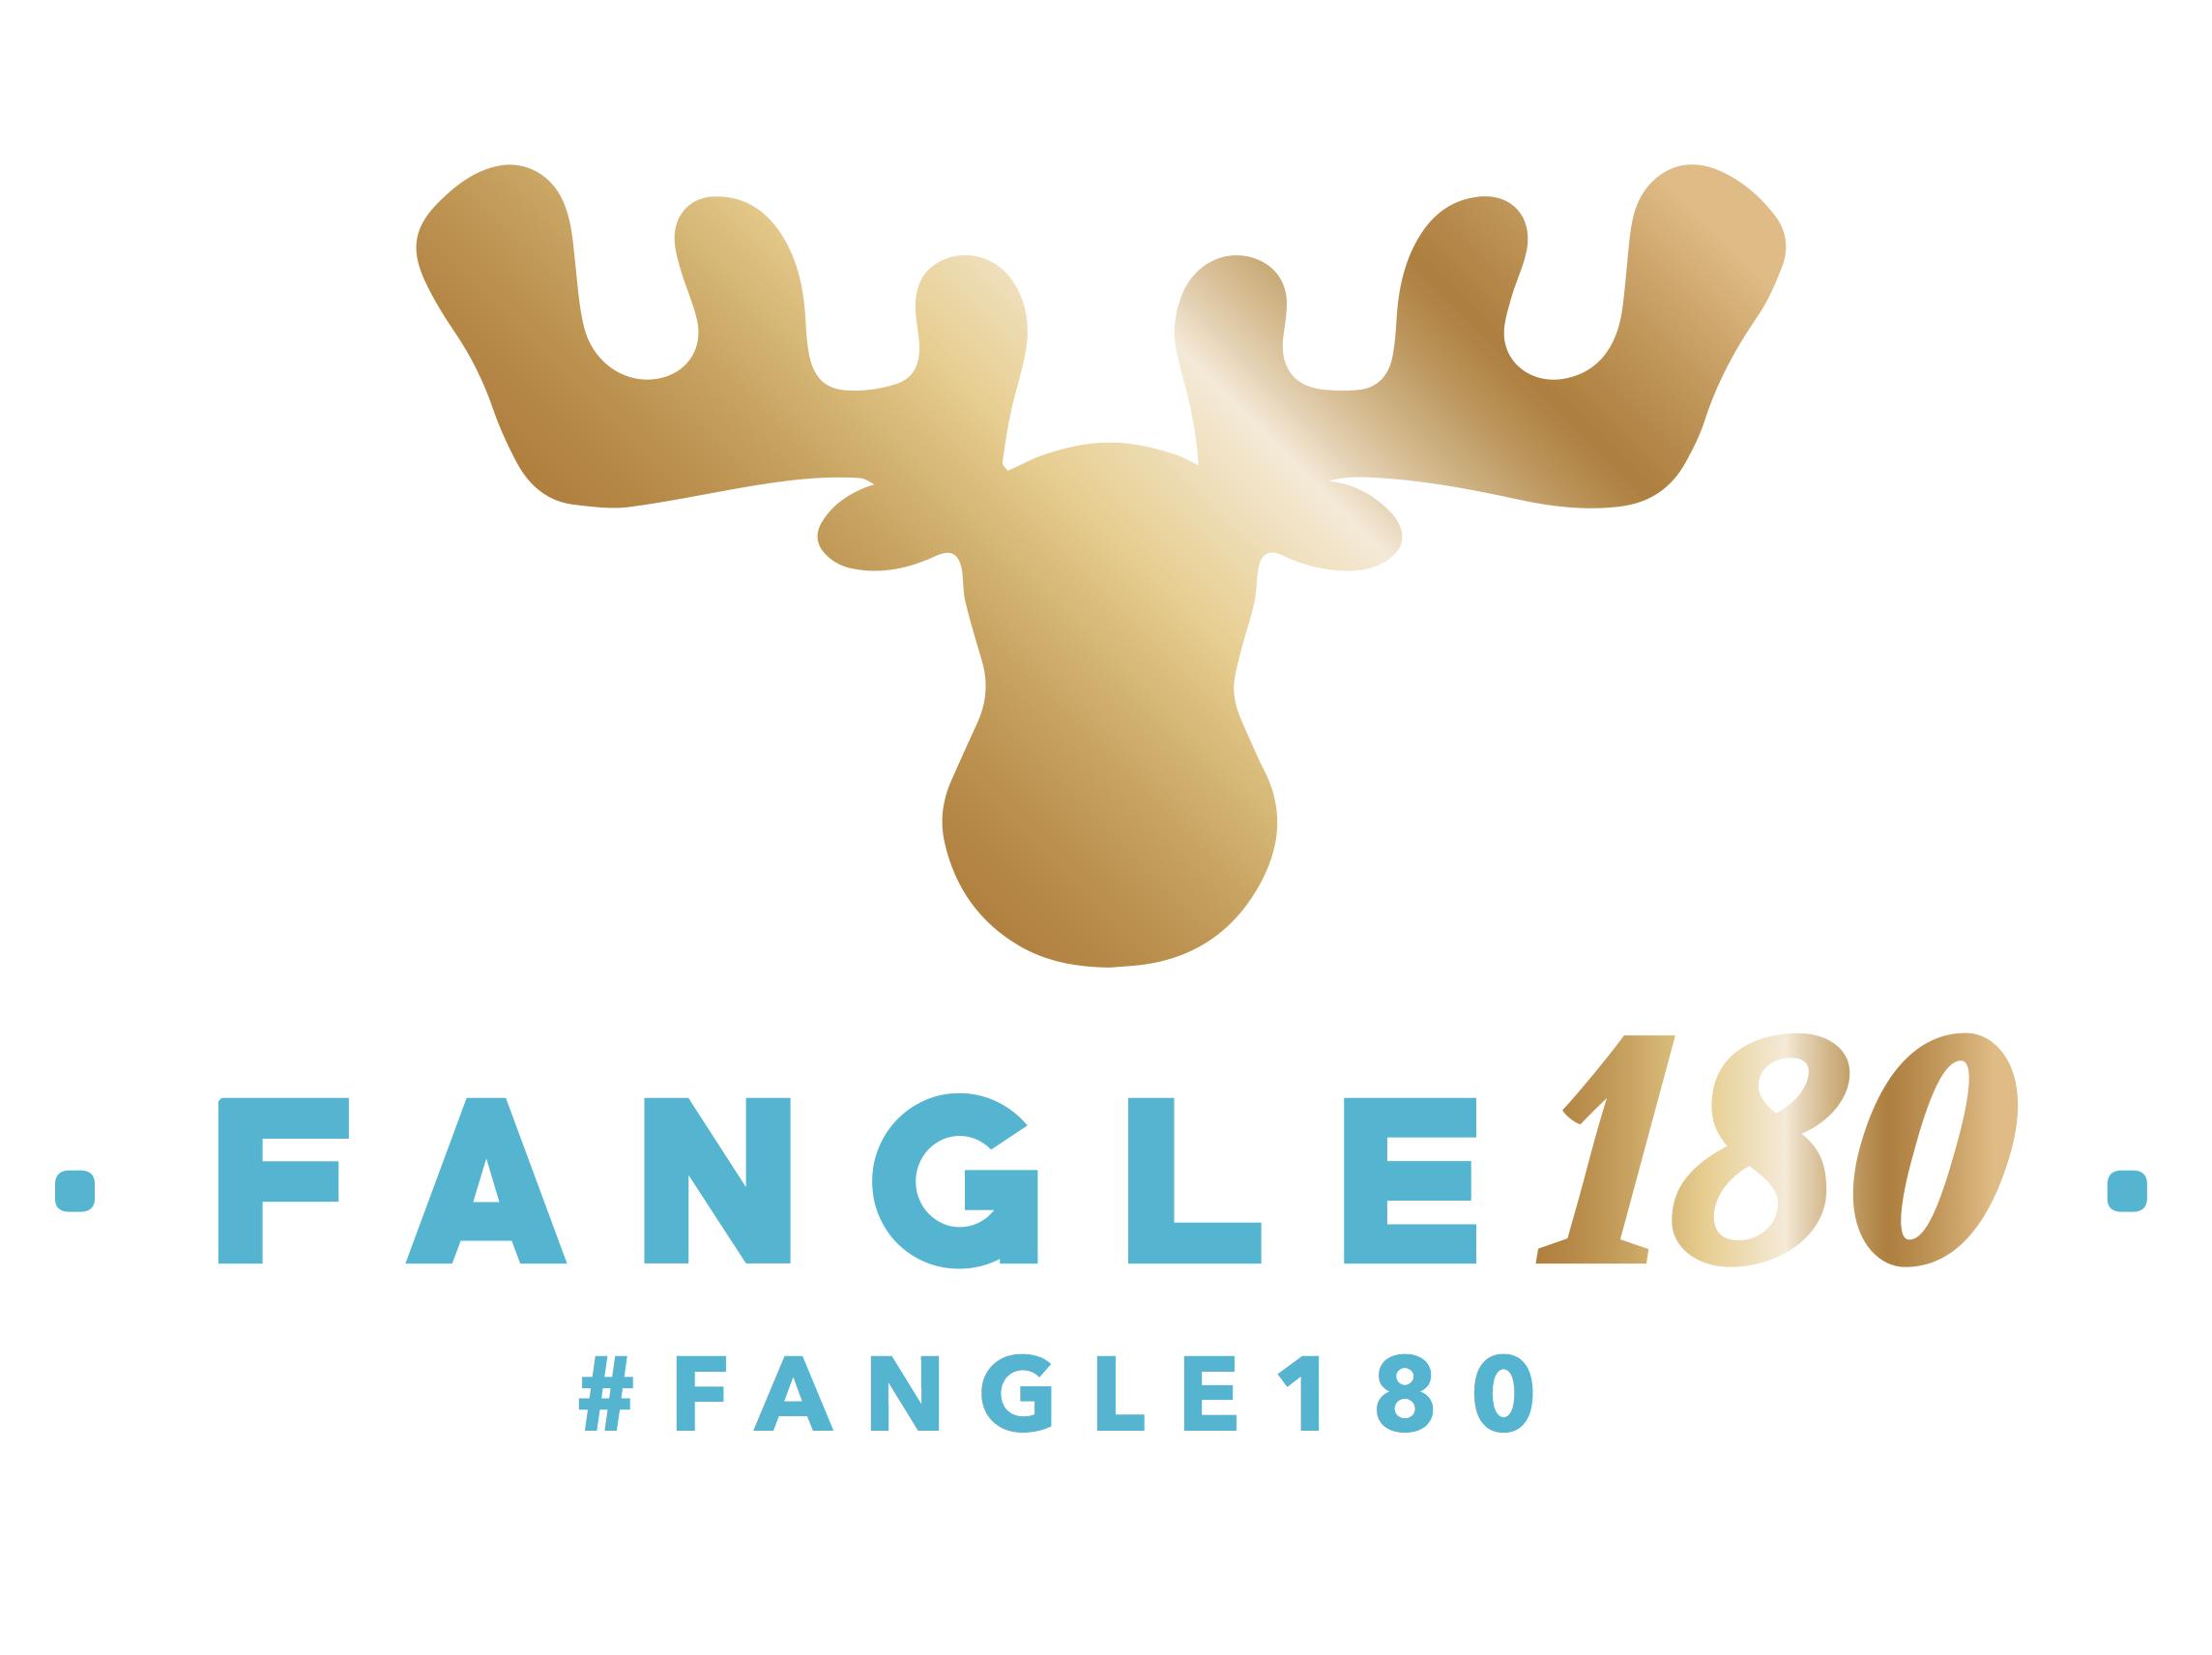 Fangle180